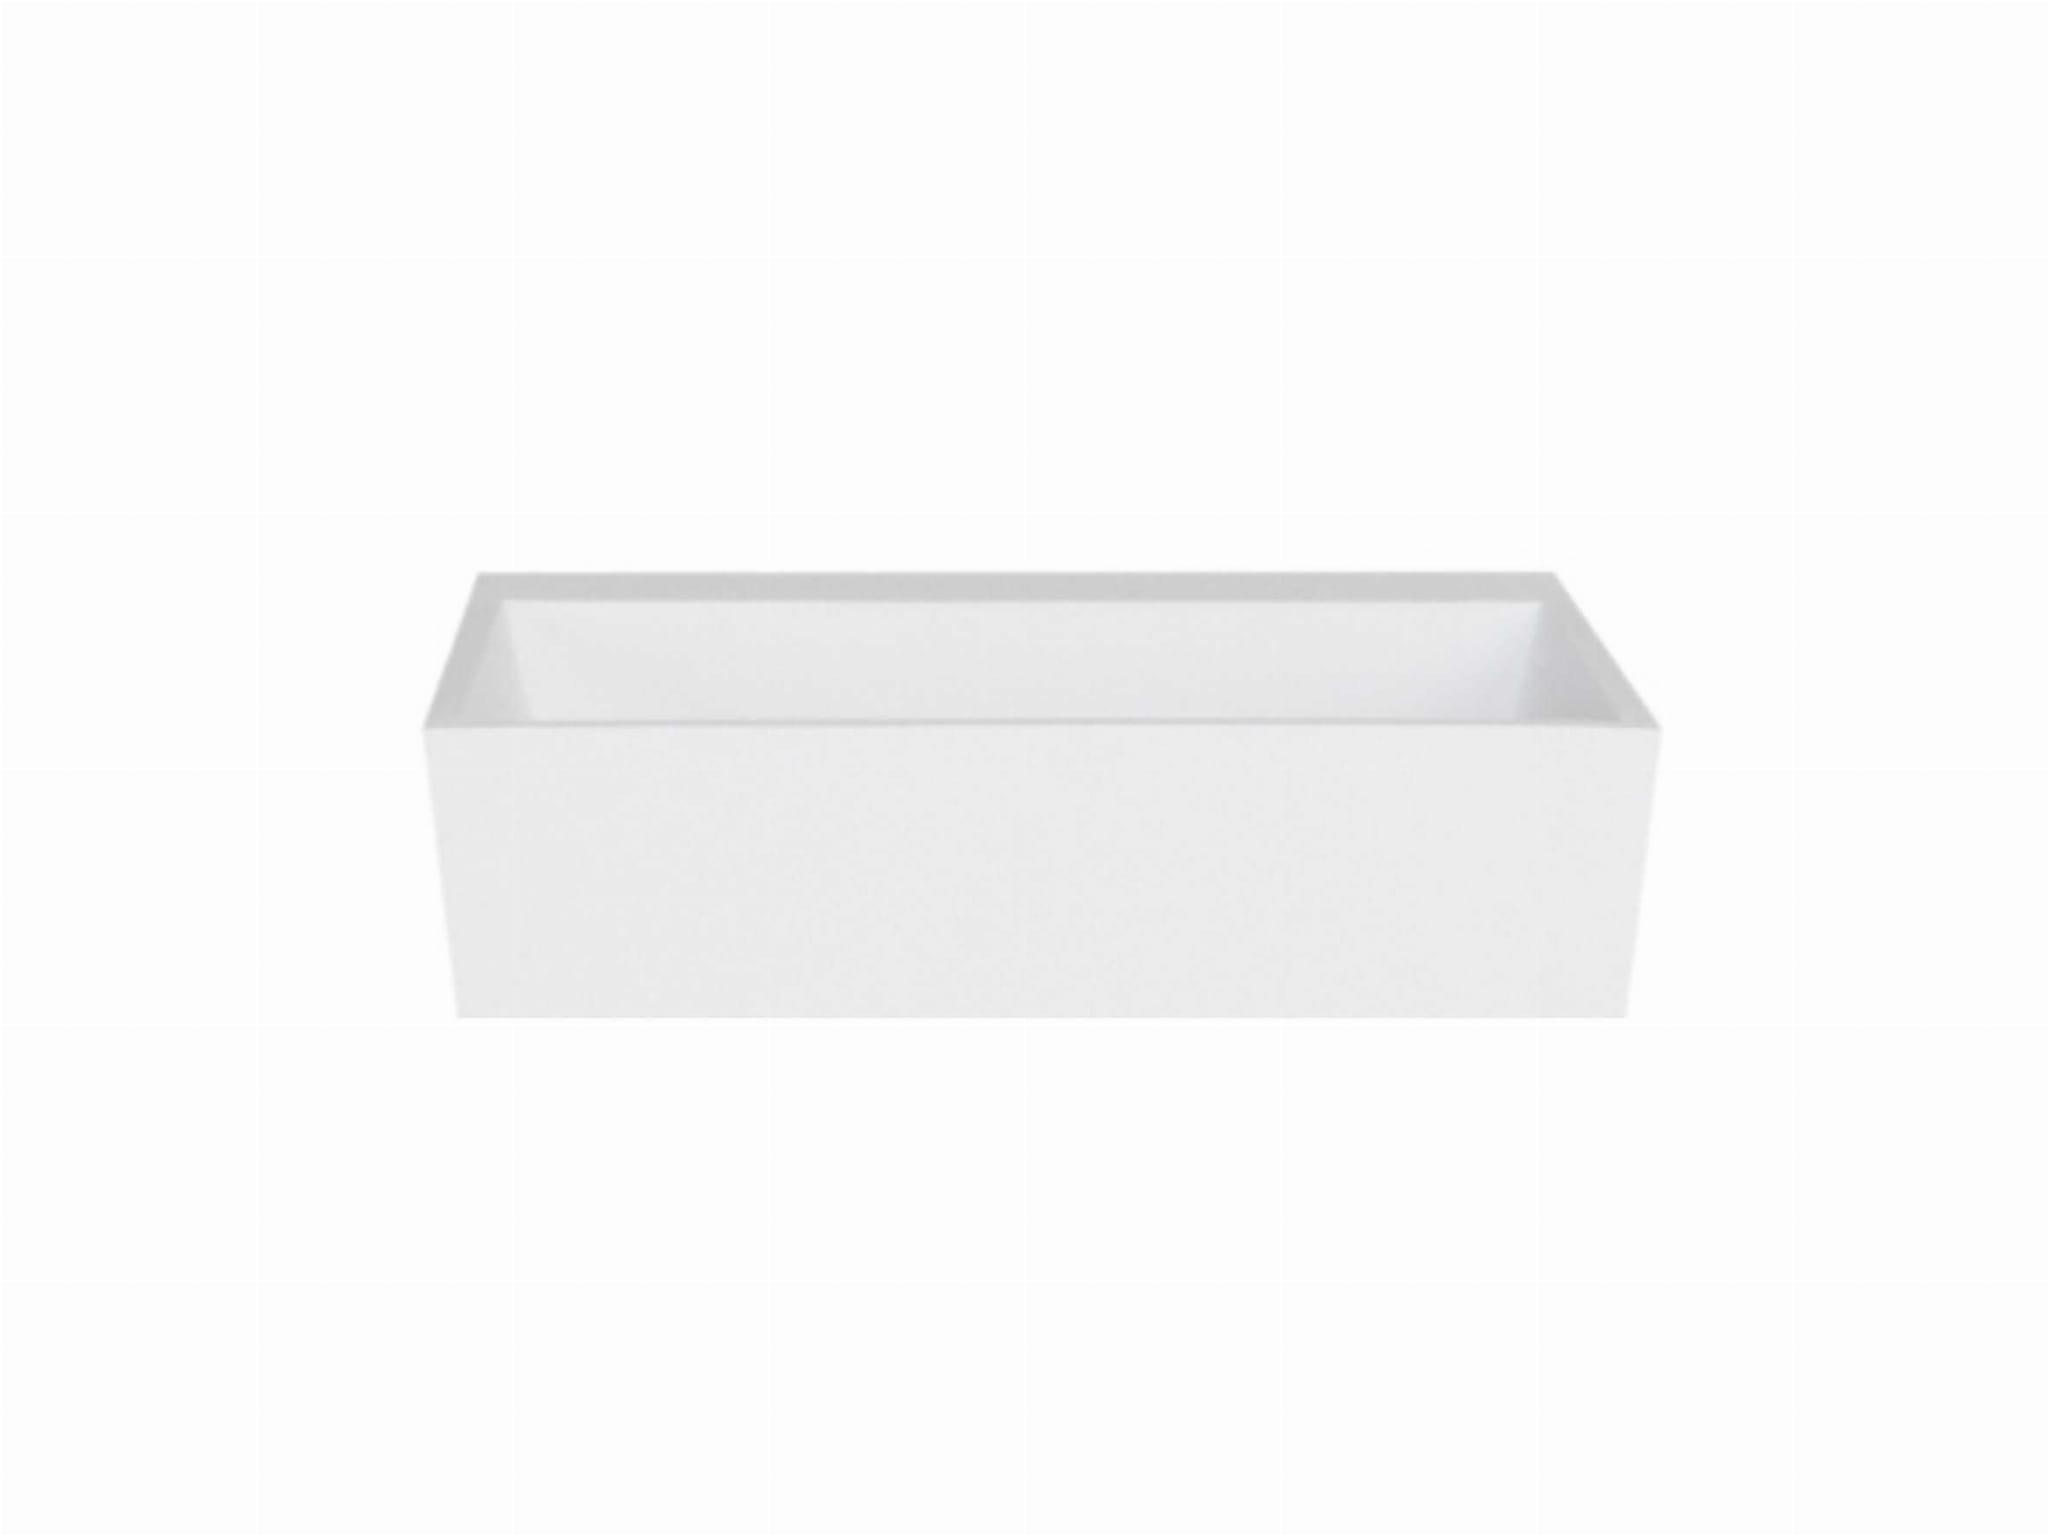 Besco umywalka nablatowa Vera 40x50x15 cm biała